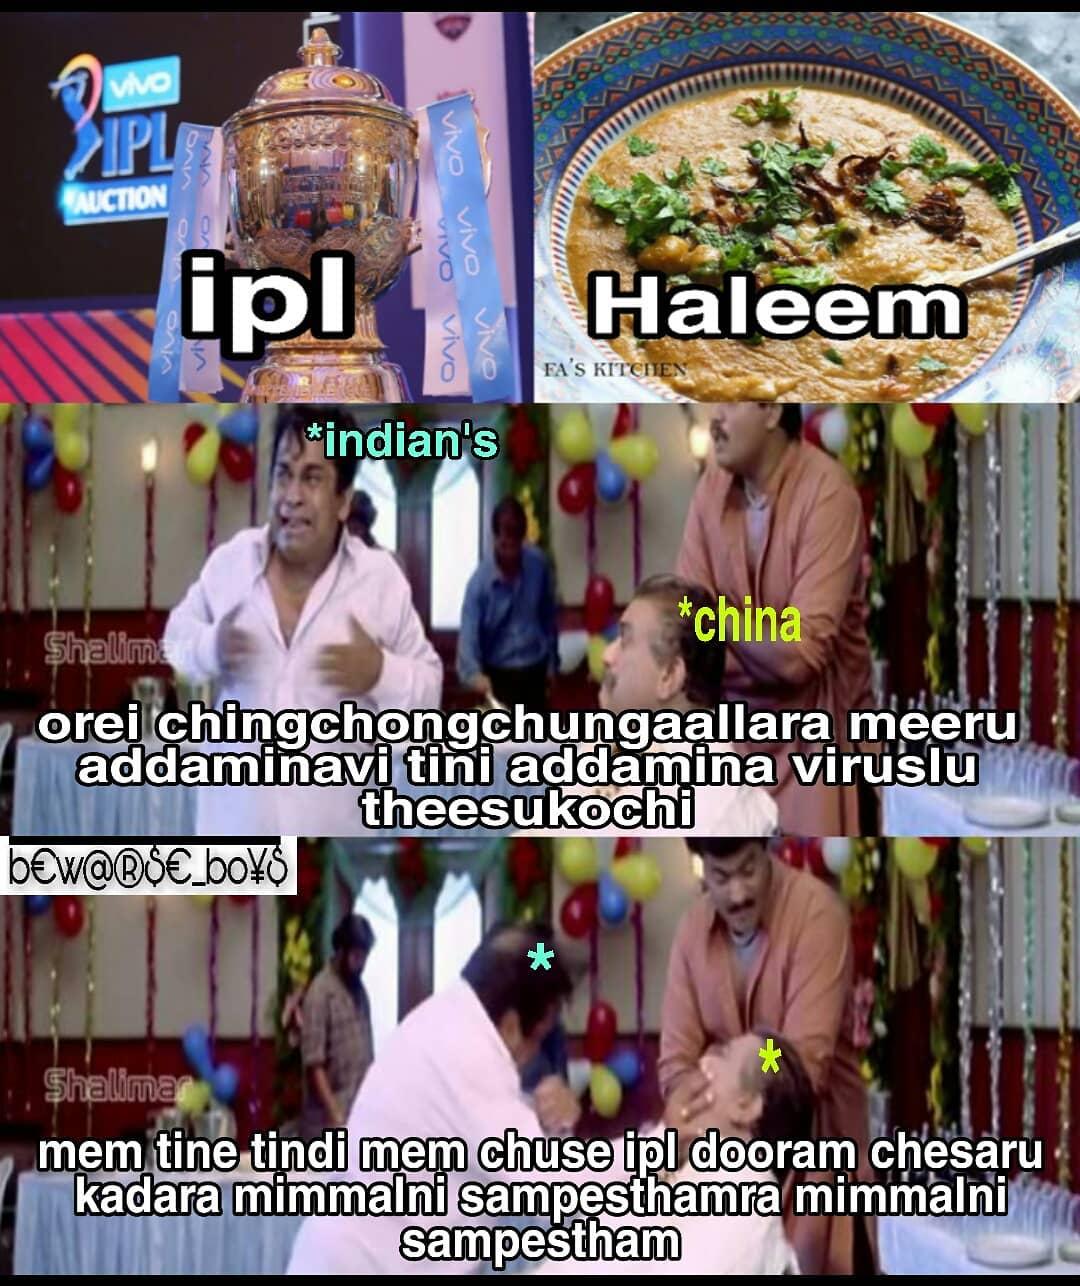 5. Haleem Memes